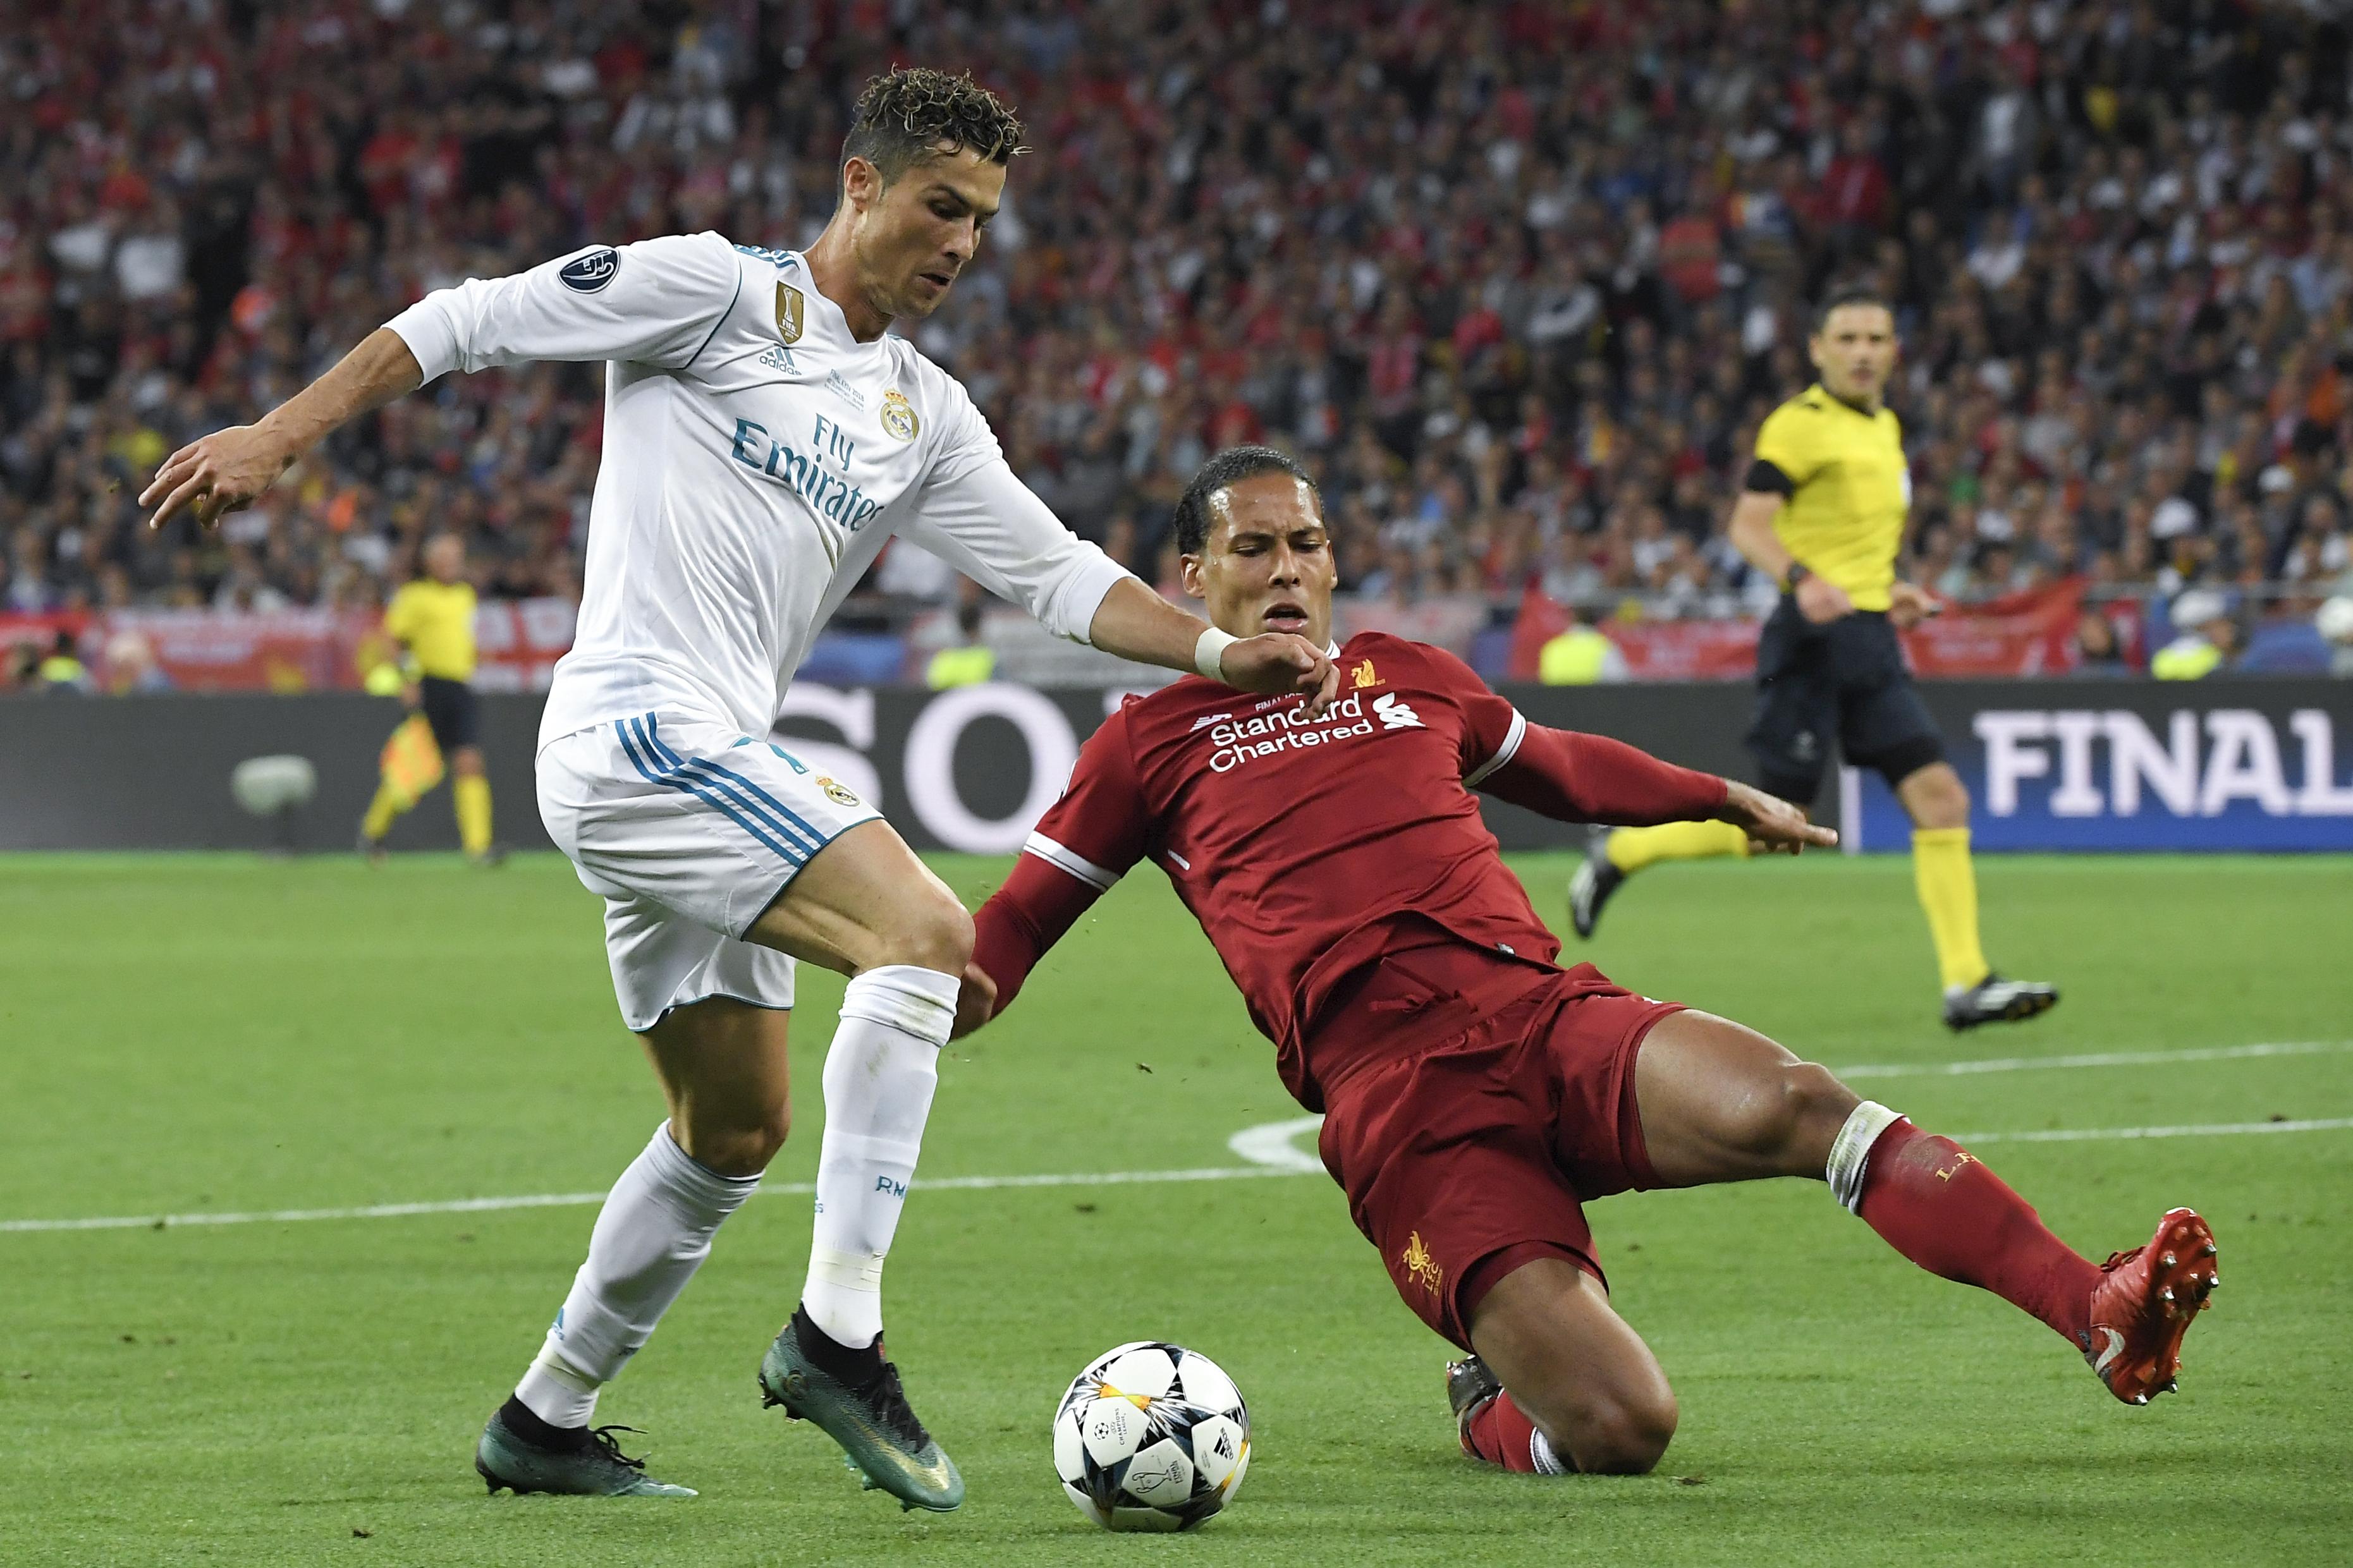 Ronaldo bejelentette, hogy elhagyja a Madridot?